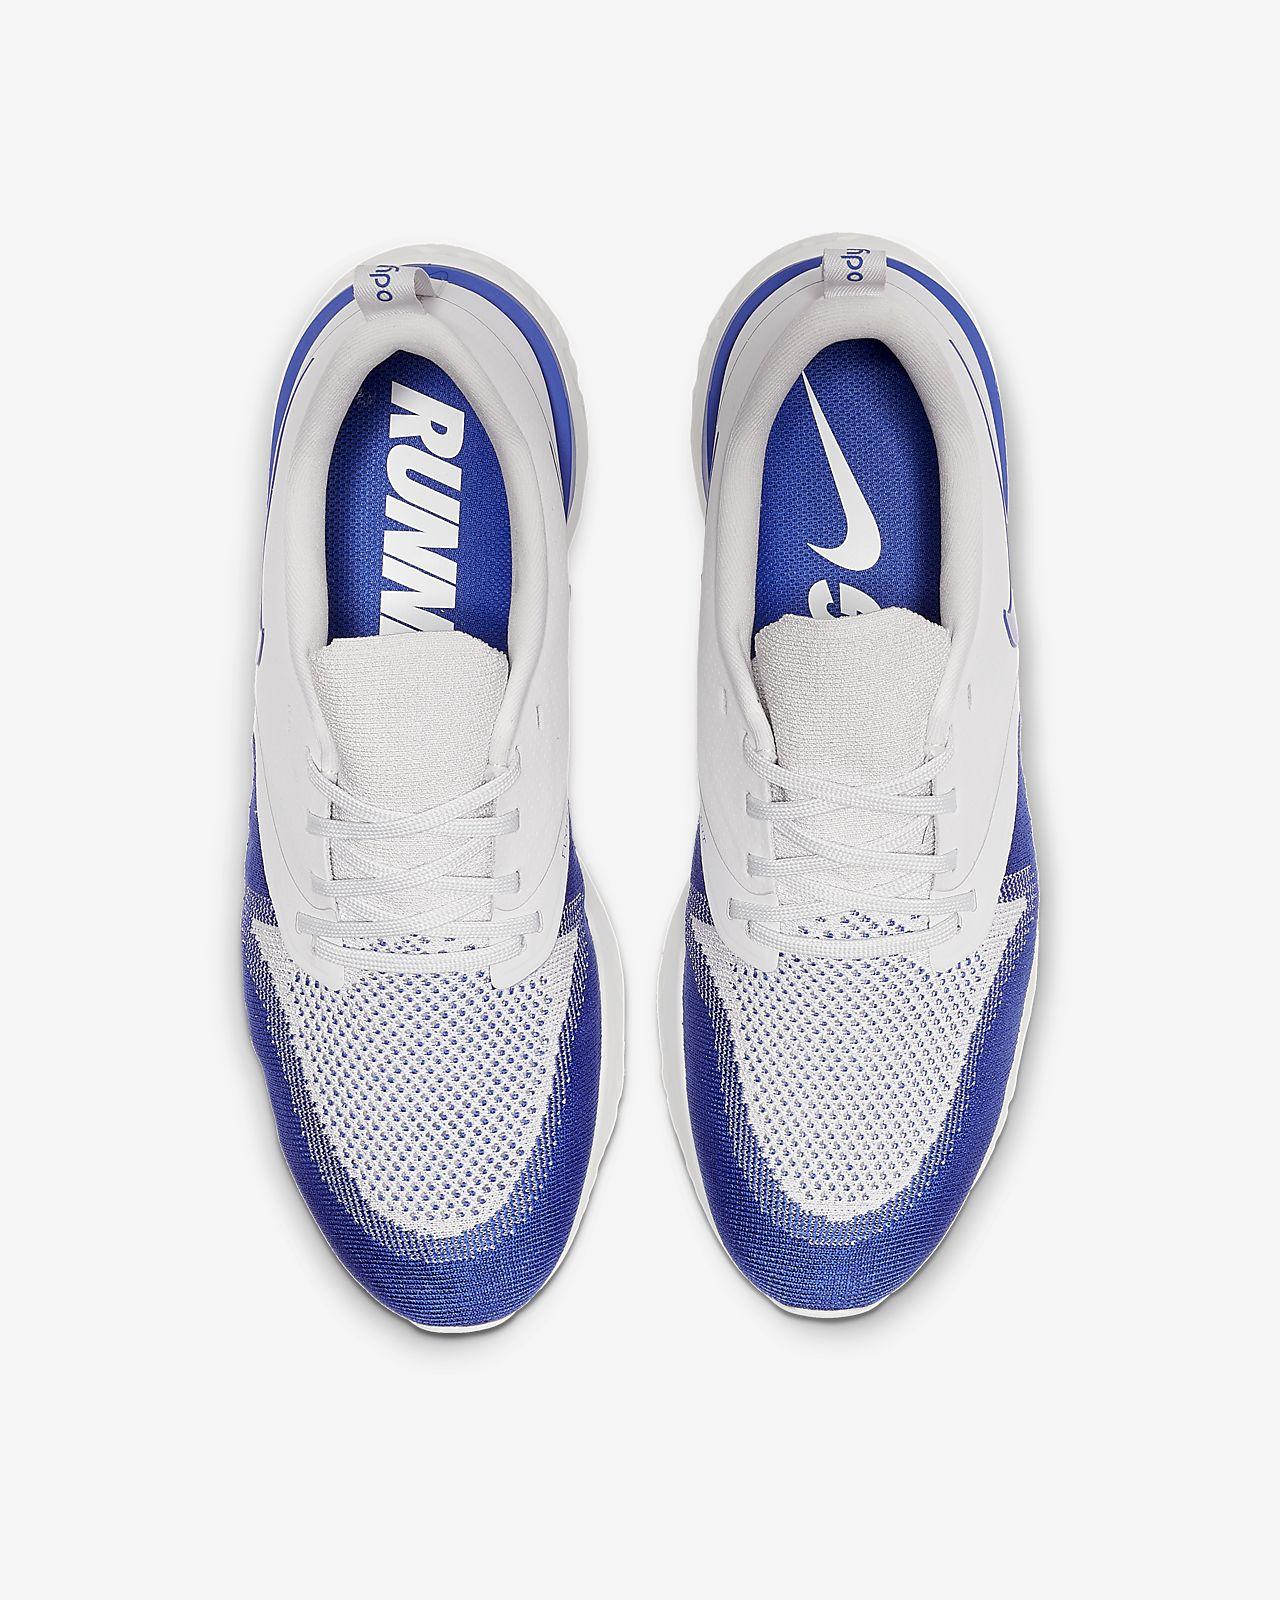 24ee6bc82acb Nike Odyssey React Flyknit 2 Men s Running Shoe. Nike.com